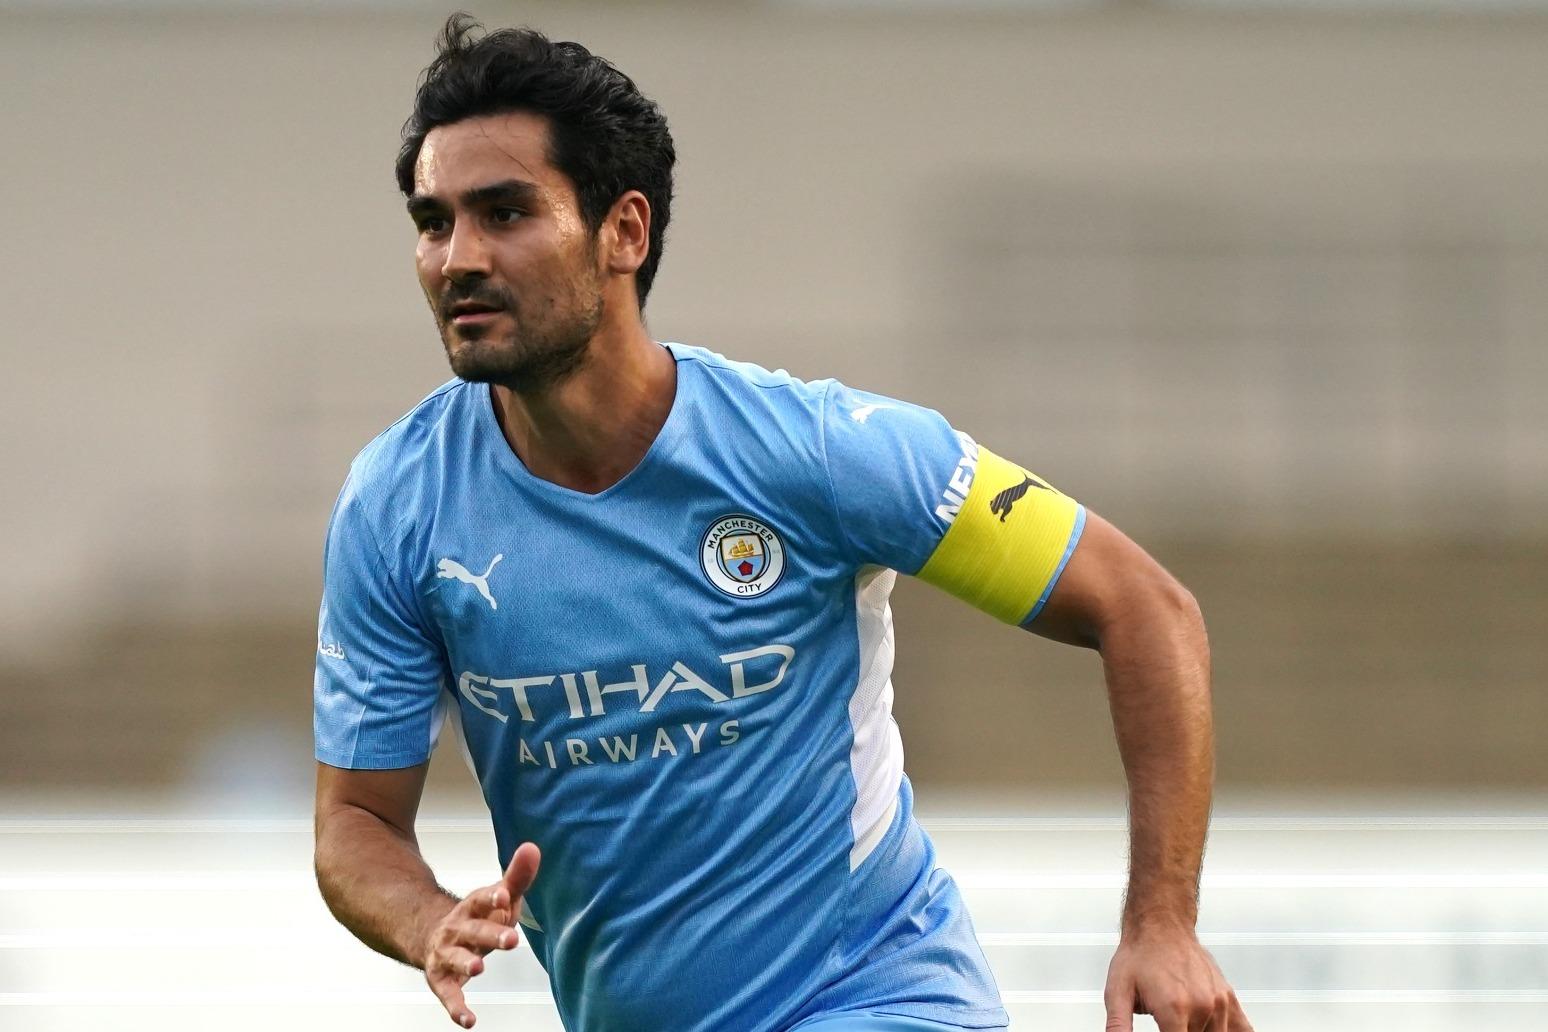 Manchester City to assess Ilkay Gundogan's shoulder injury on Monday